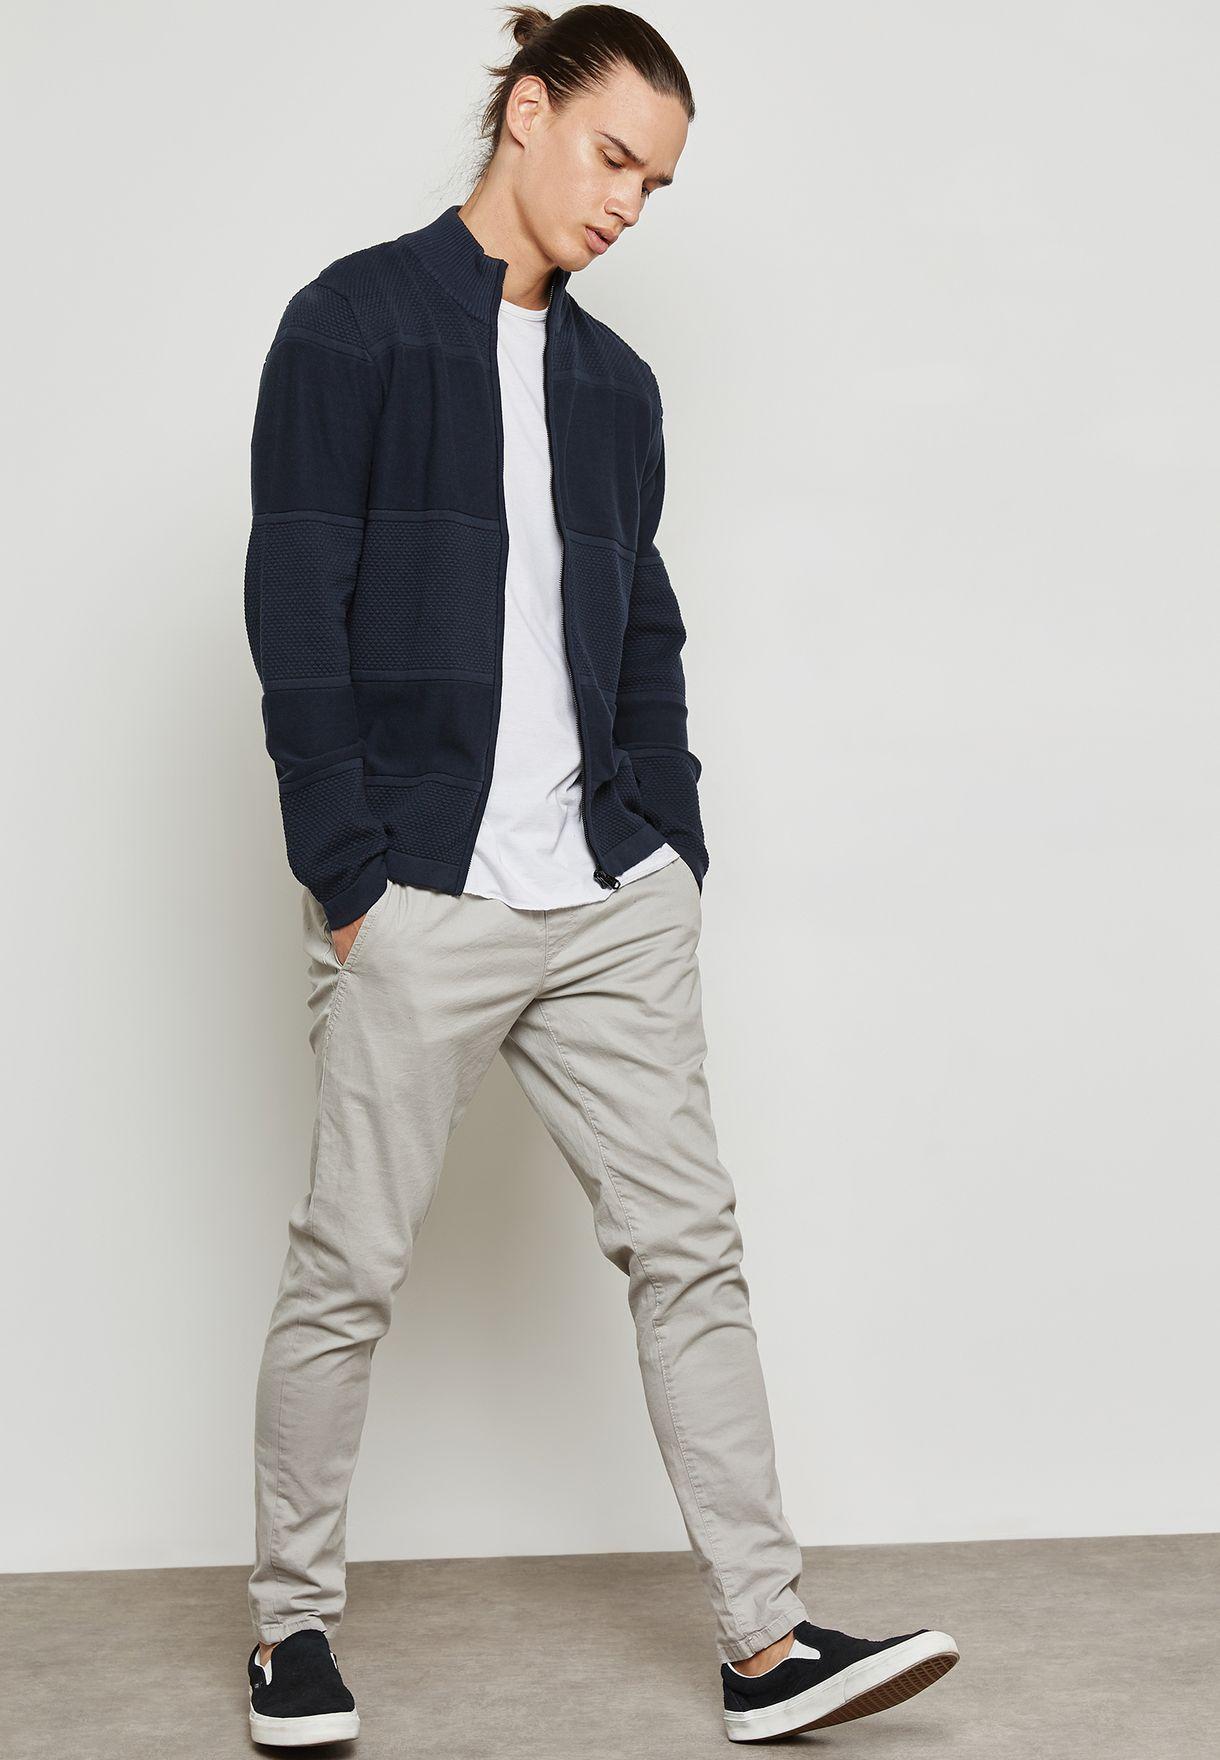 Shop Jack Jones navy Rouge Knitted Cardigan 12125205 for Men in ... 8c93e93fdd6